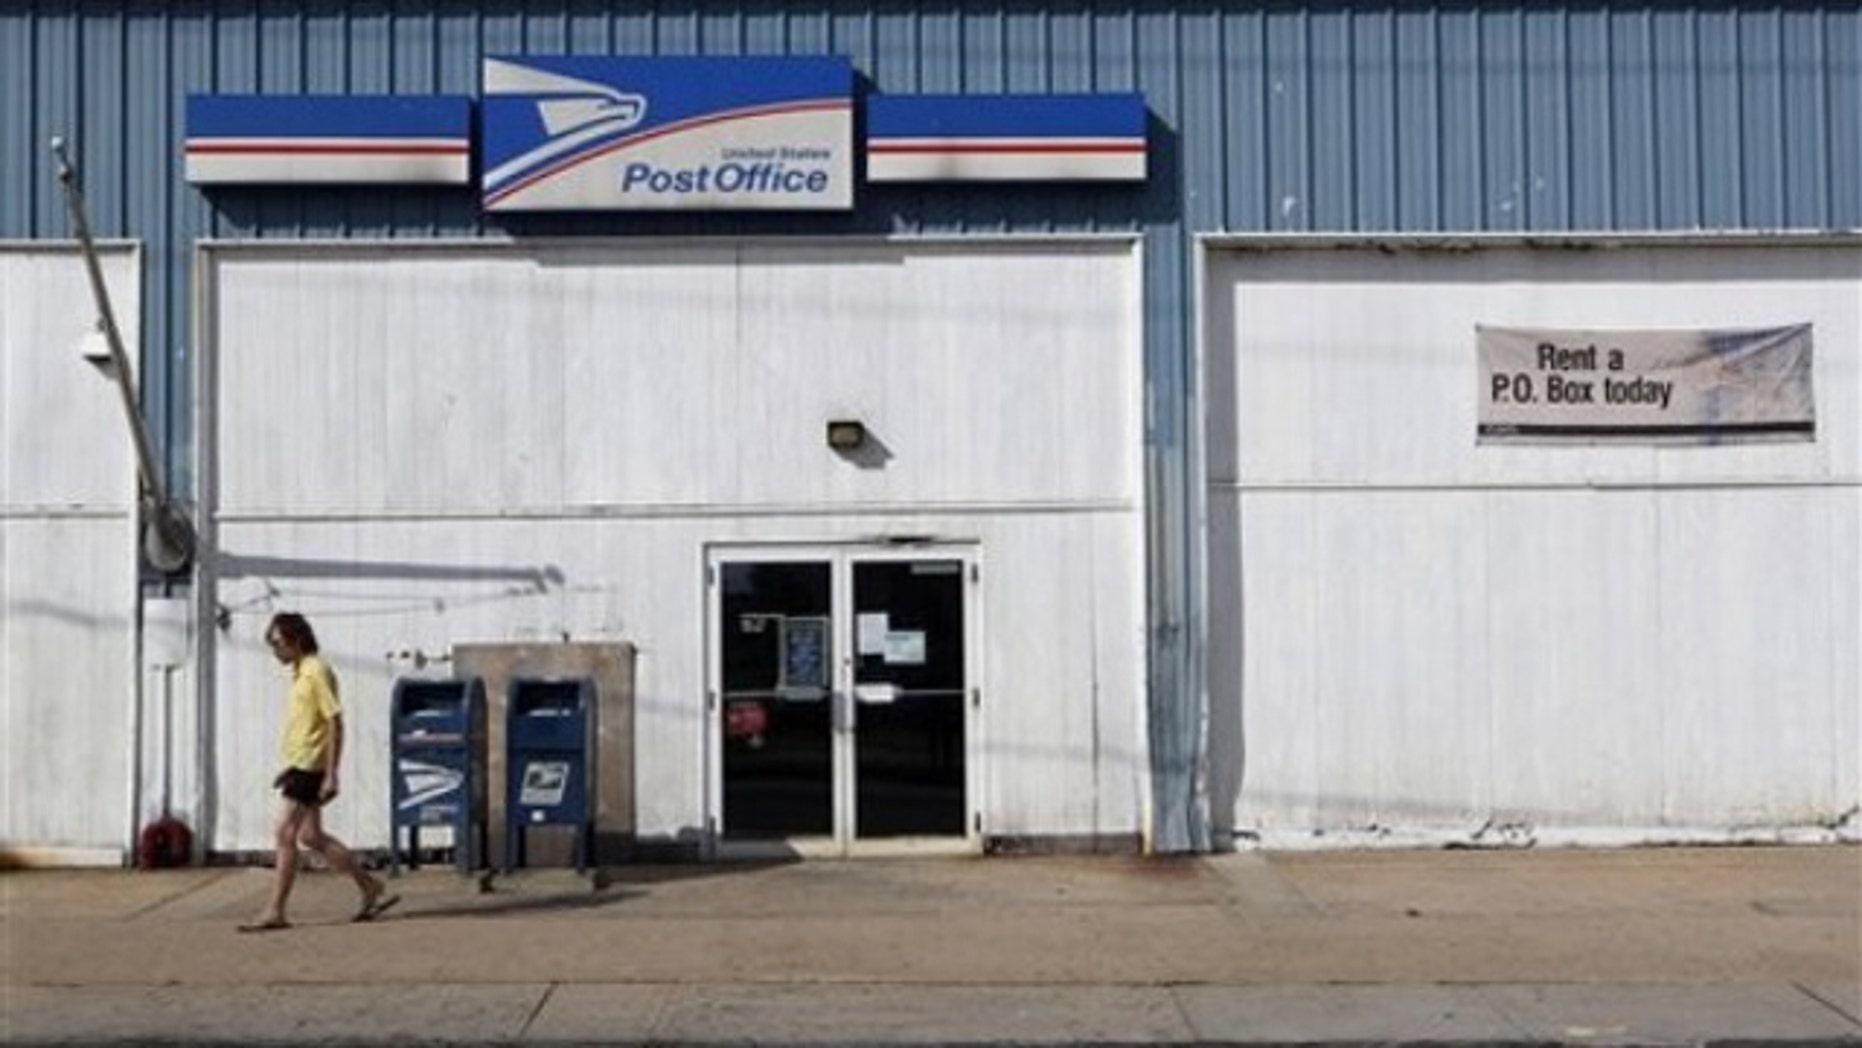 A man walks away from a post office July 27 in New Brunswick, N.J.